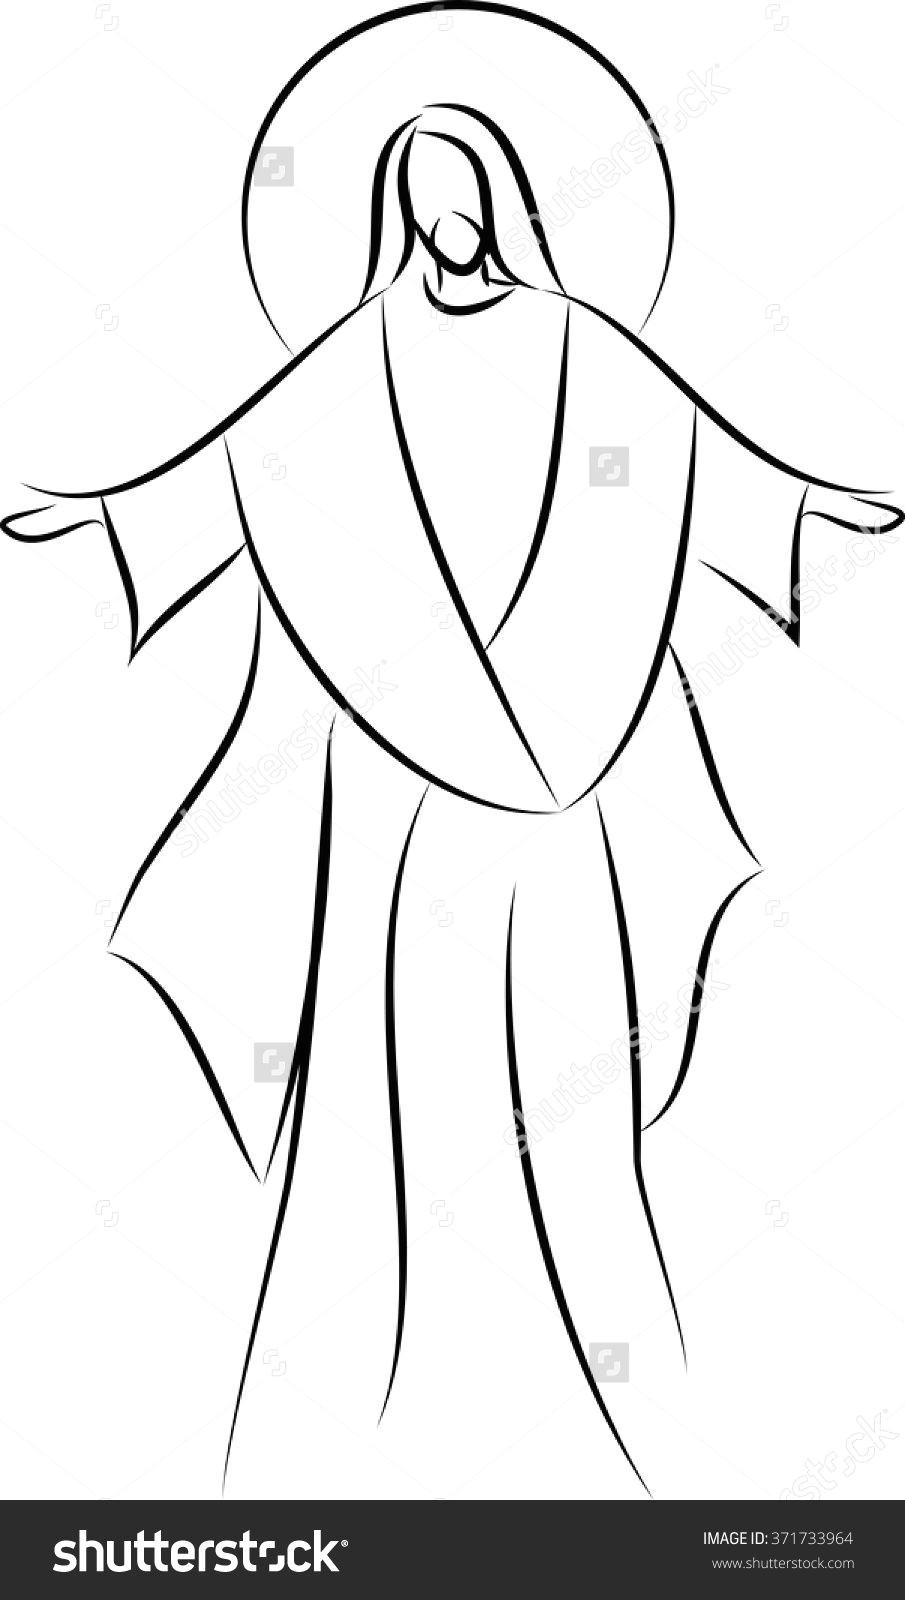 christian drawings christian art jesus christ jesus christ images jesus sketch